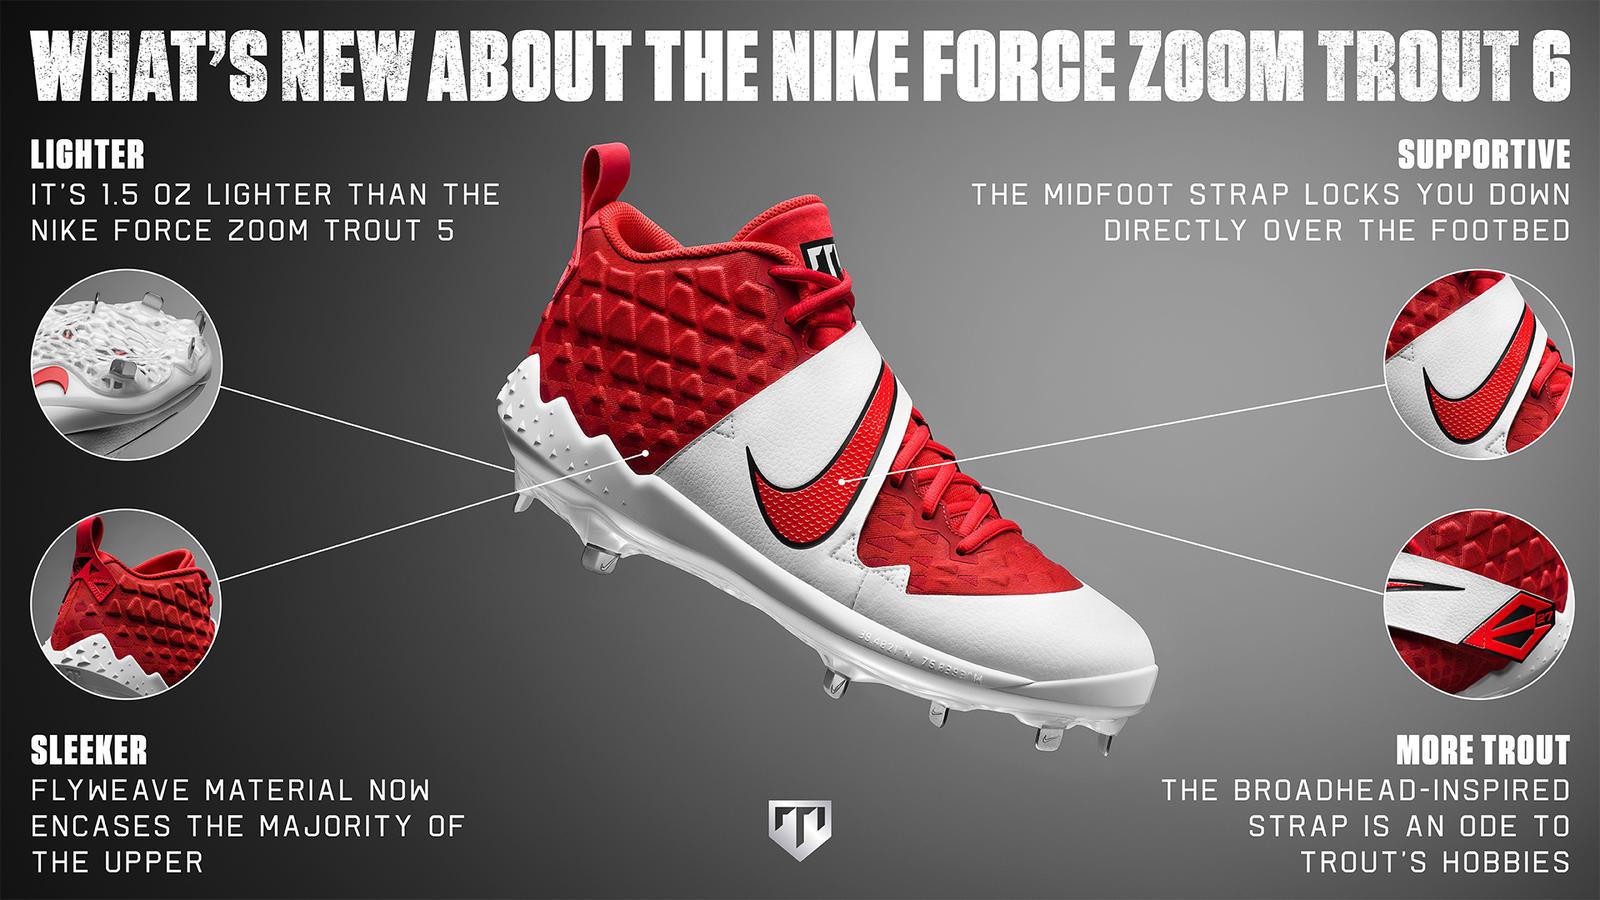 News Brand's Future Jordan Designing Nike ymN0OPvw8n